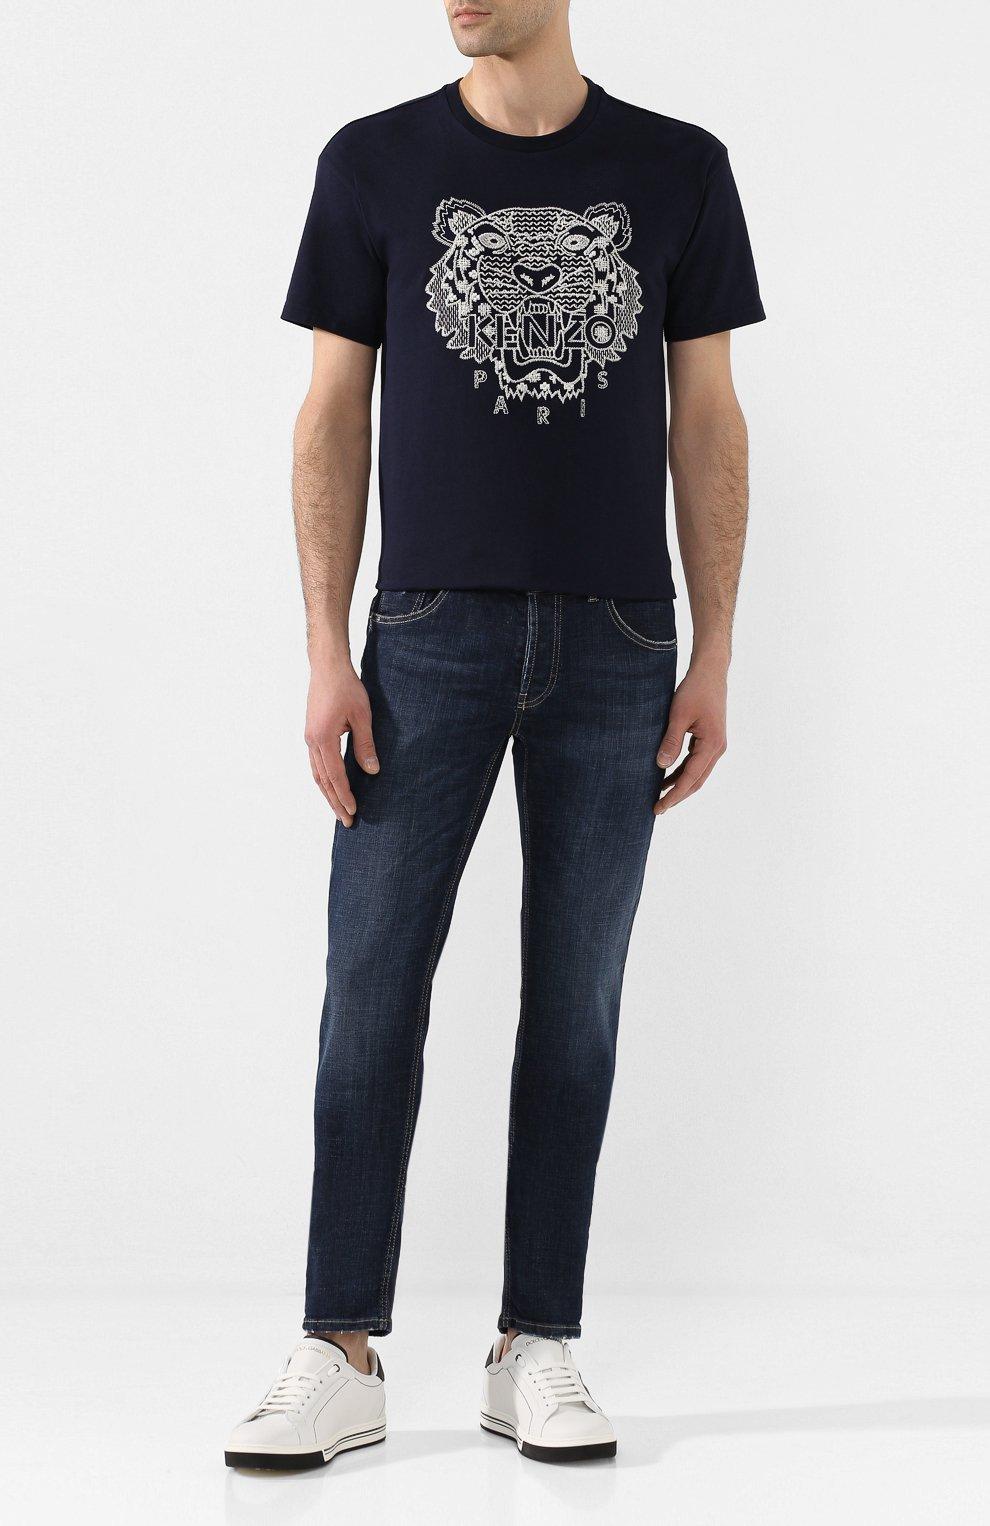 Мужские джинсы PREMIUM MOOD DENIM SUPERIOR темно-синего цвета, арт. S20 0310340011/PAUL | Фото 2